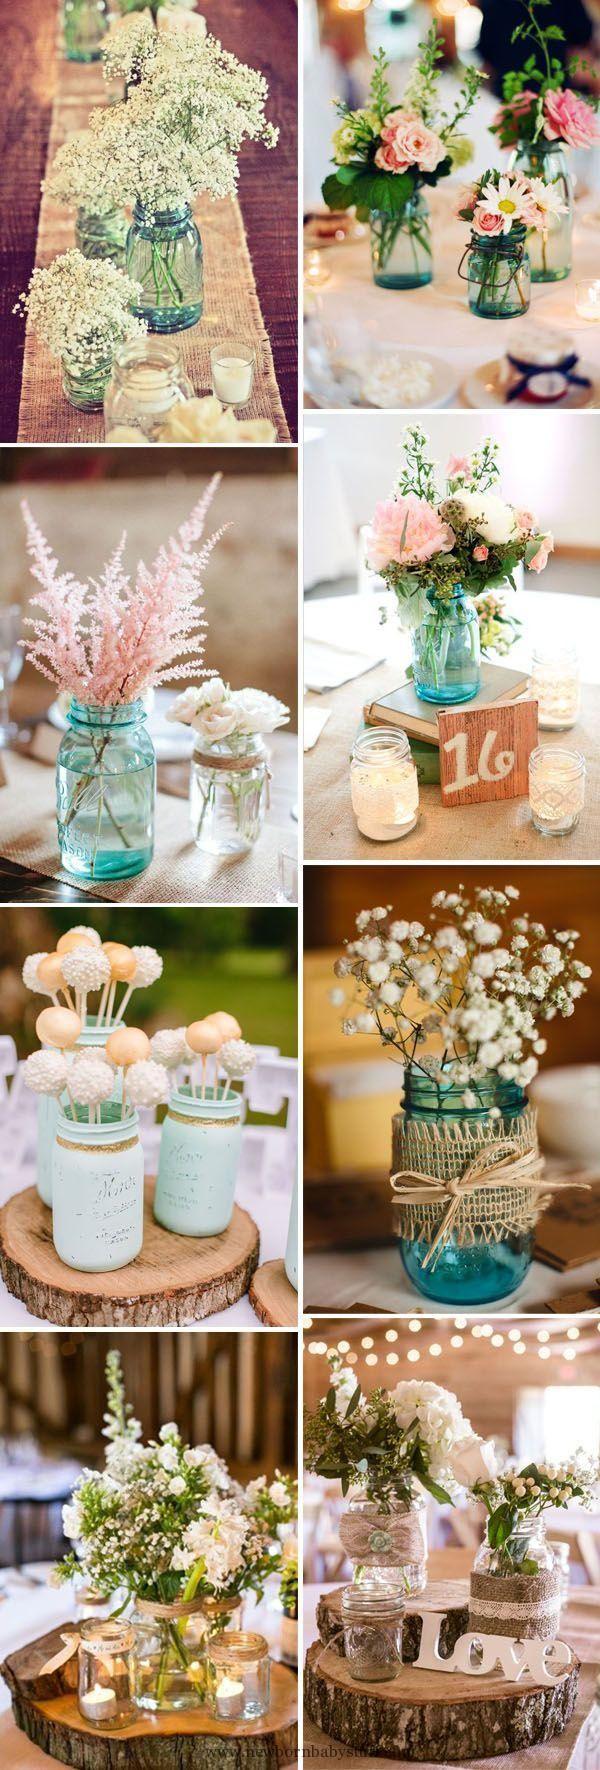 Baby accessories beautiful rustic mason jar wedding centerpieces